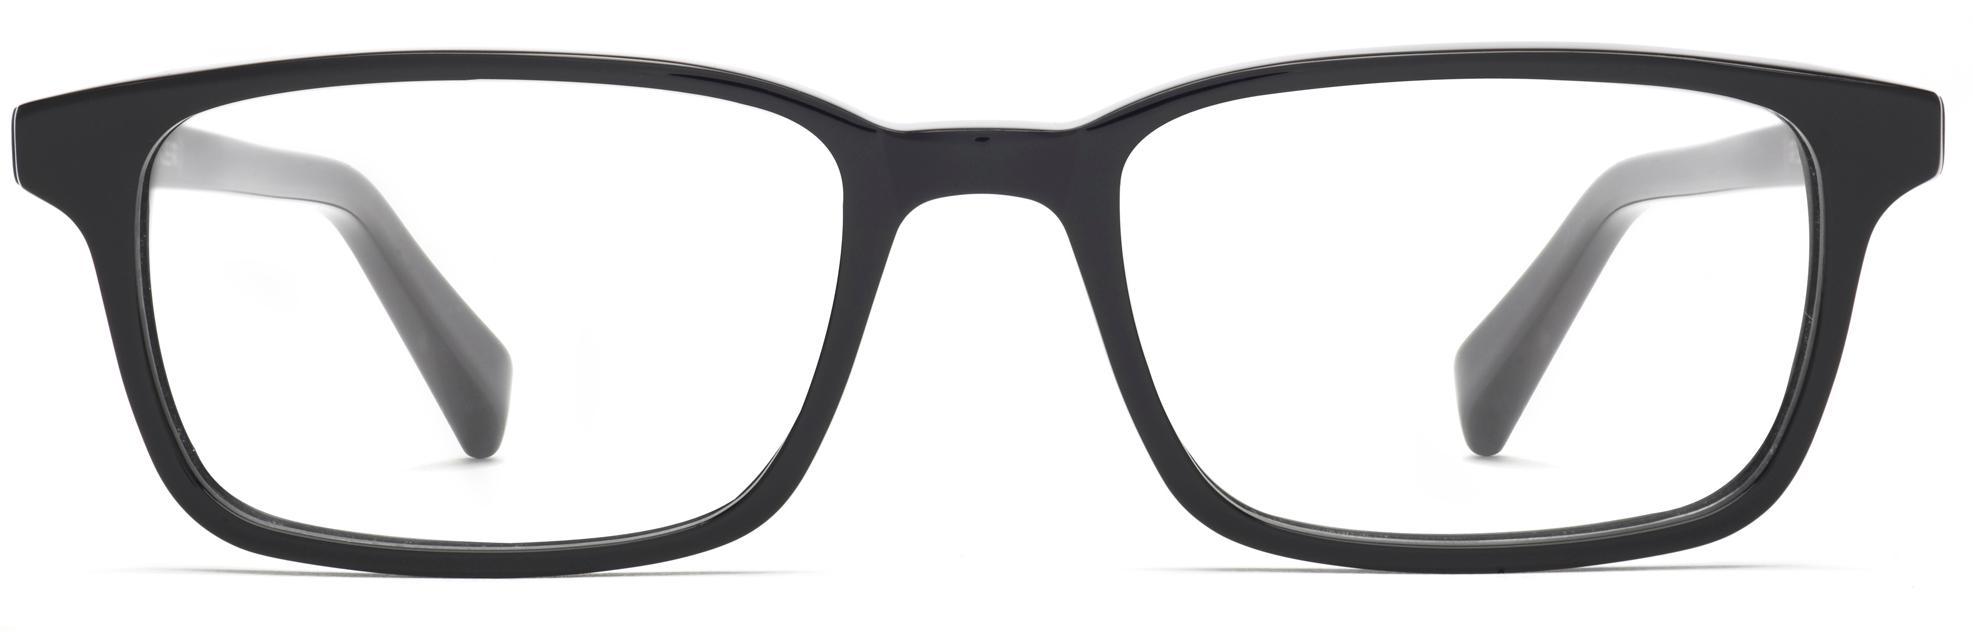 womens eyeglasses warby parker - Women Eyeglass Frames